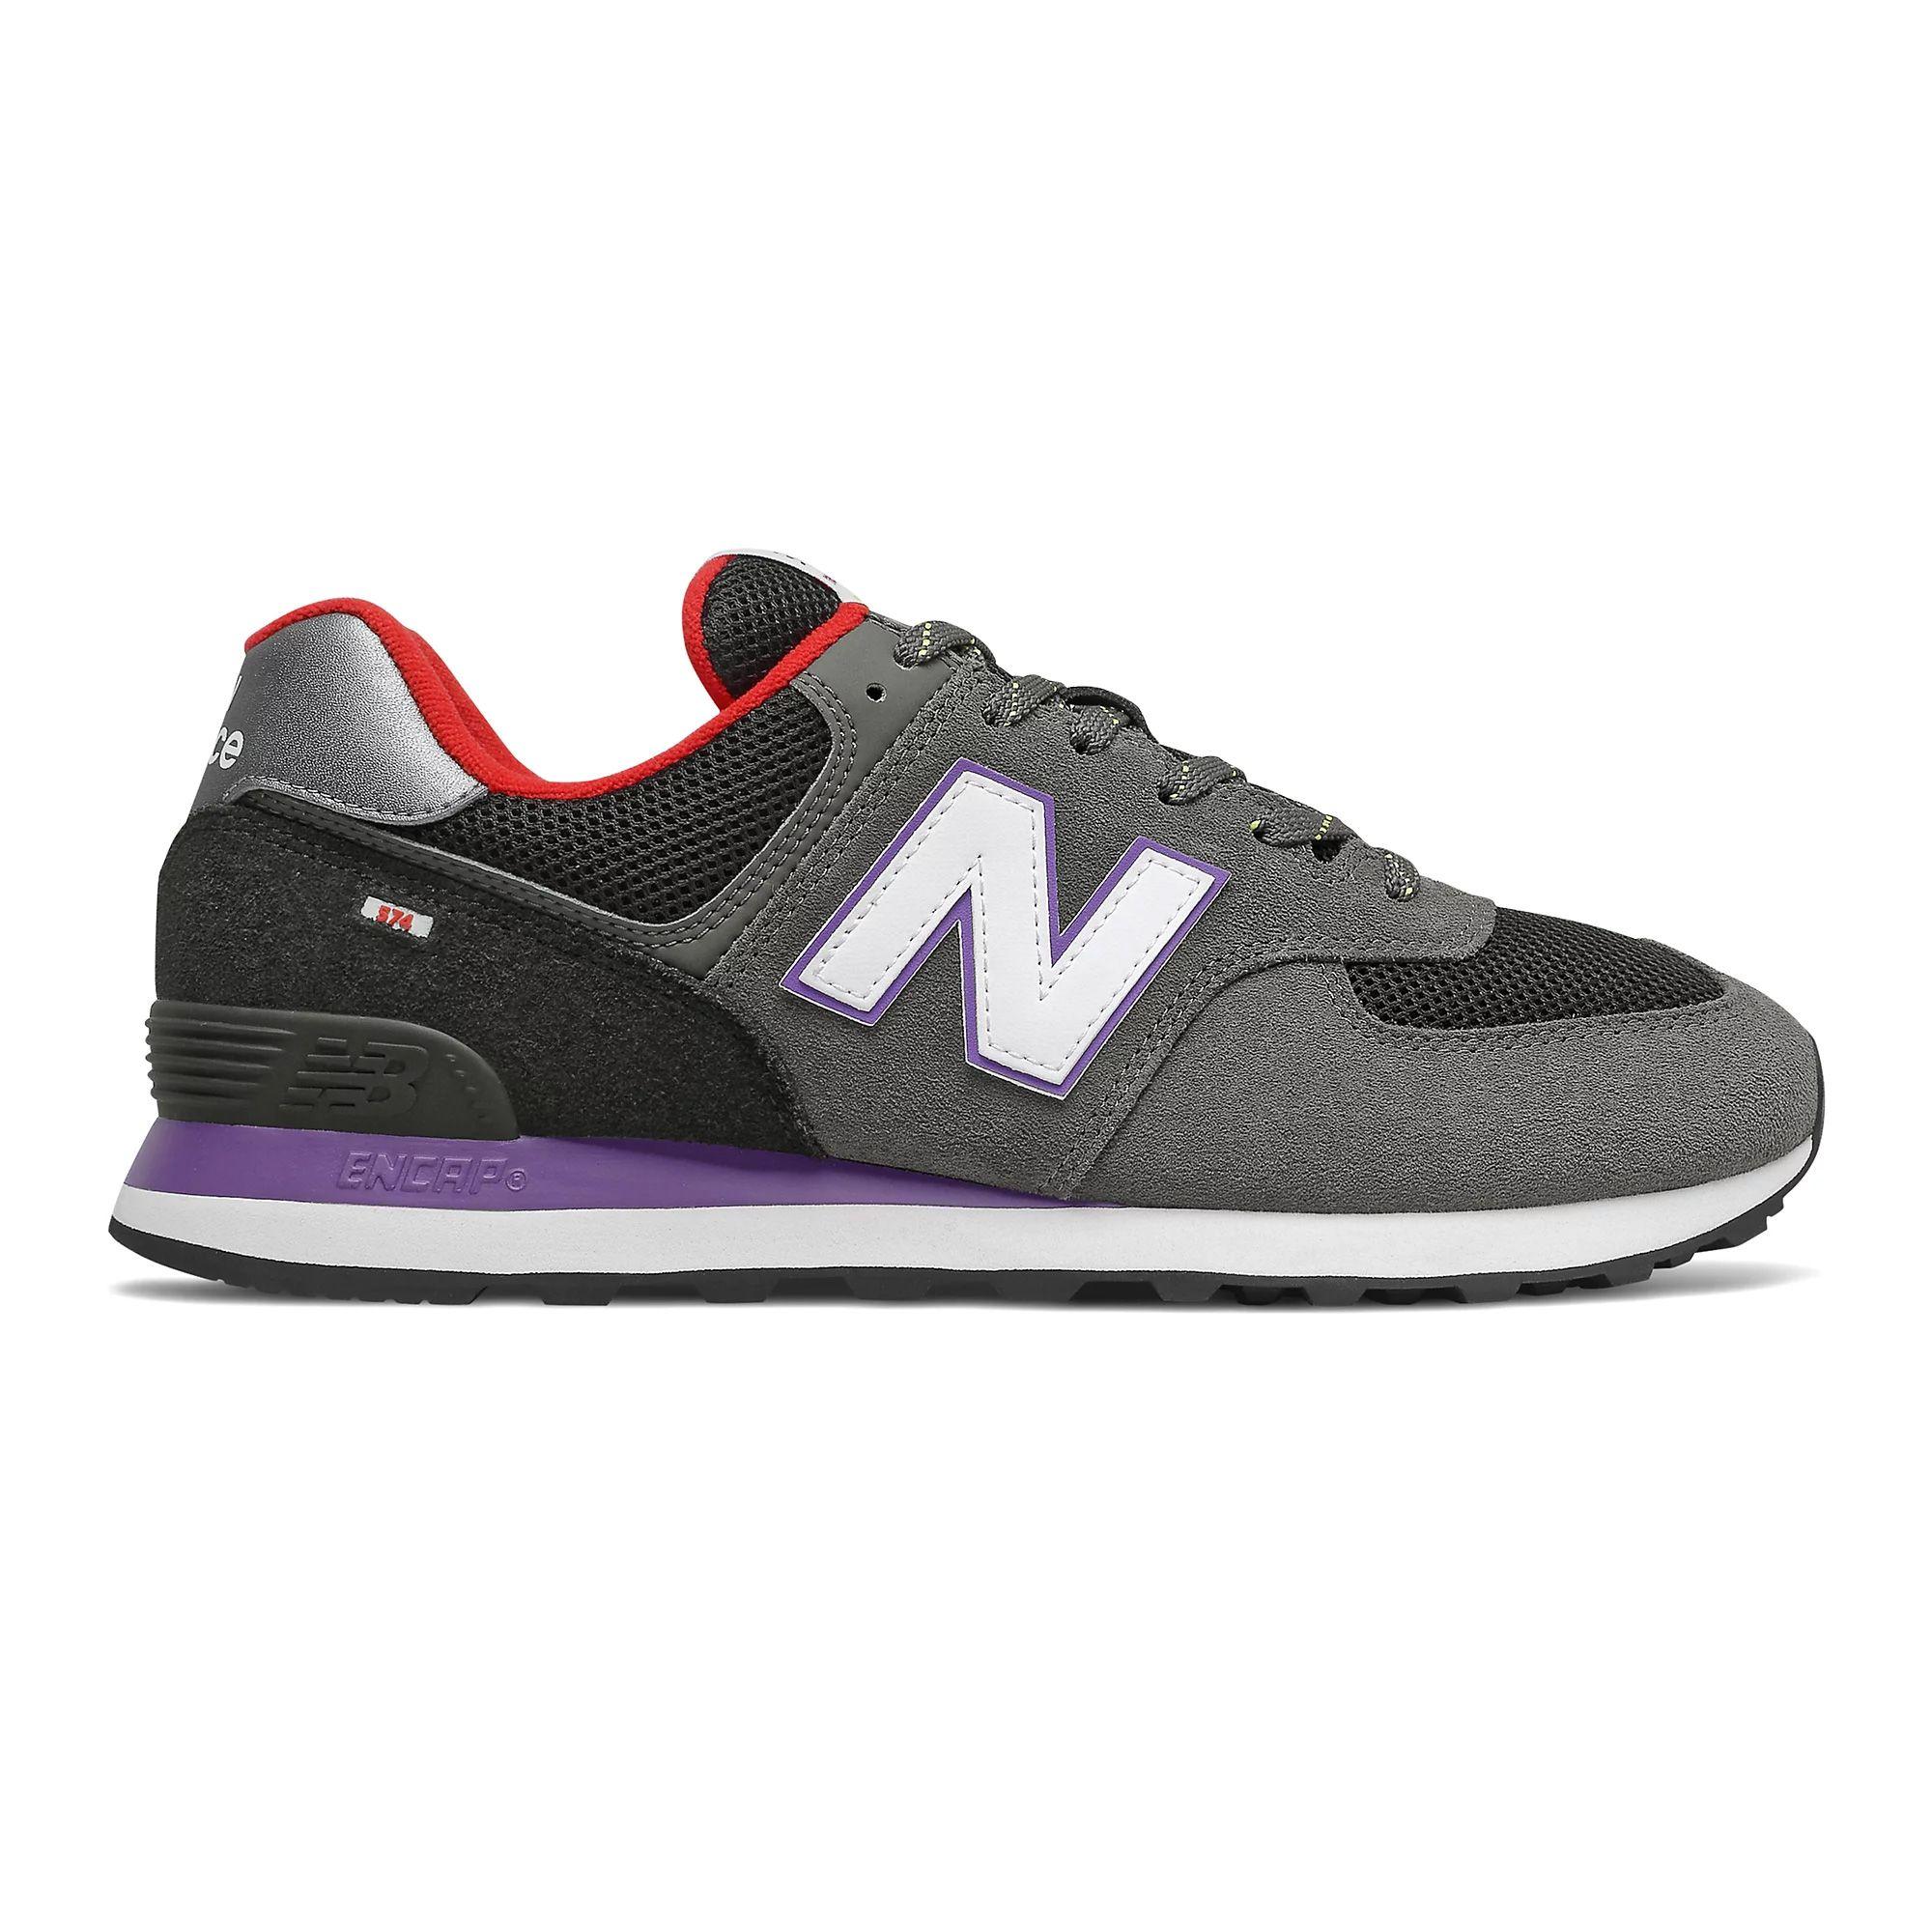 New Balance Men's 574 in Prism Purple/First Light/Grey